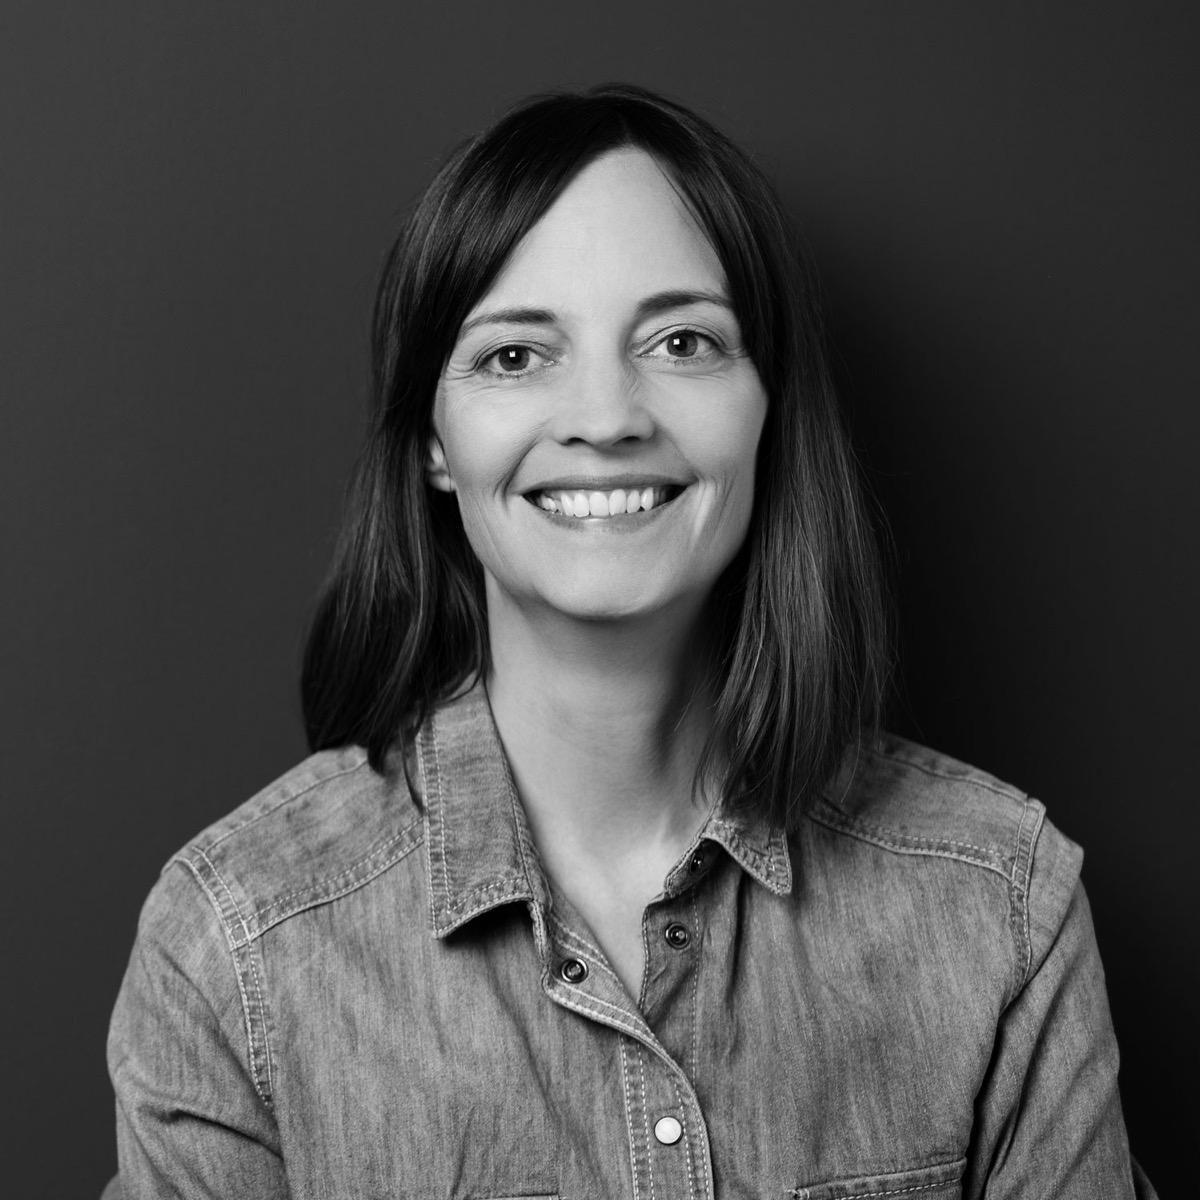 Abbie Ferguson